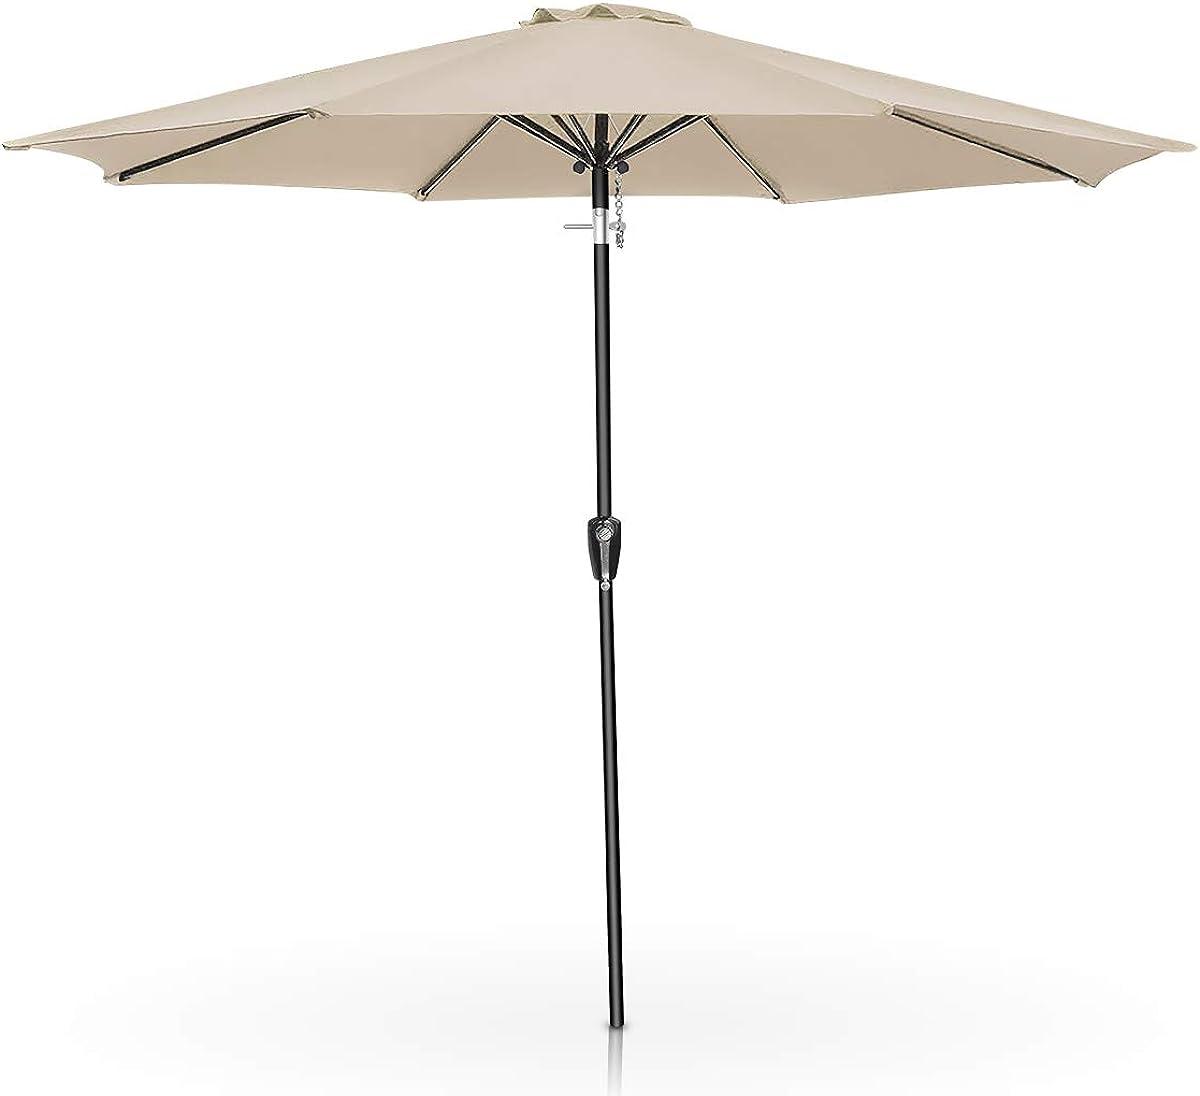 FRUITEAM 9Ft Patio Umbrella Outdoor Table Umbrella 8 Sturdy Ribs Large Garden Umbrella Heavy Duty